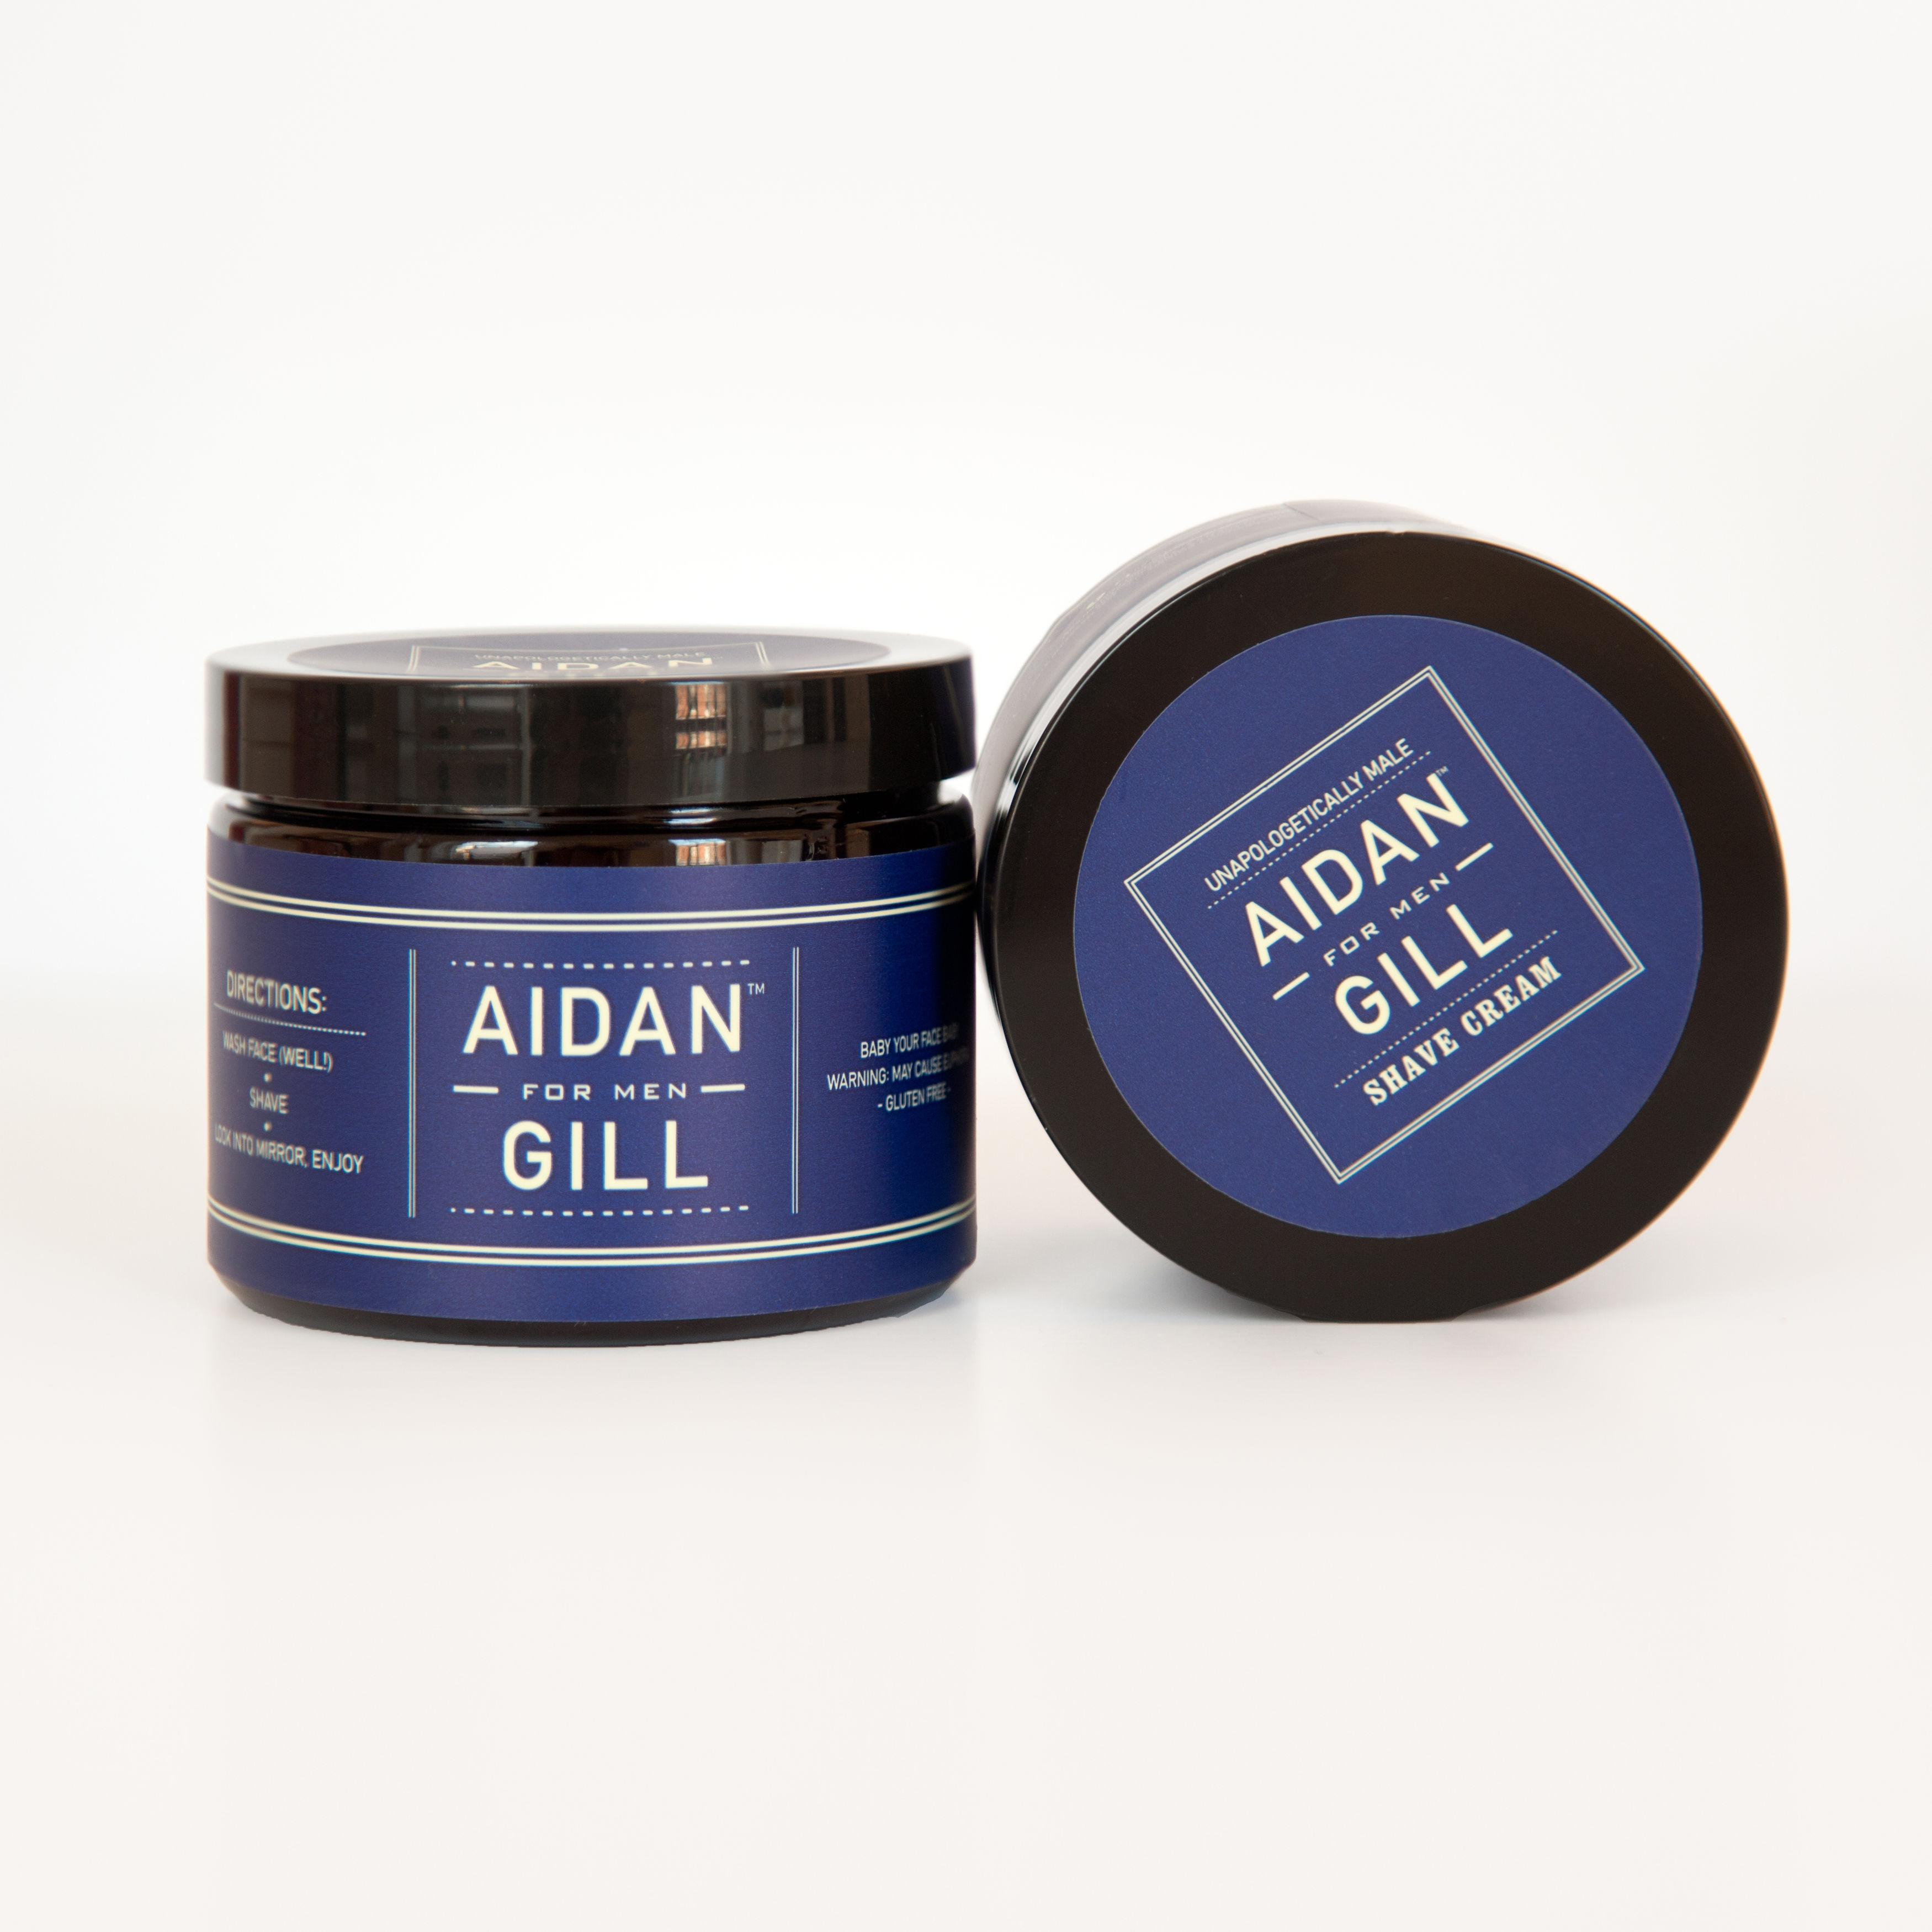 Aidan Gill for Men Sandalwood Shave Cream